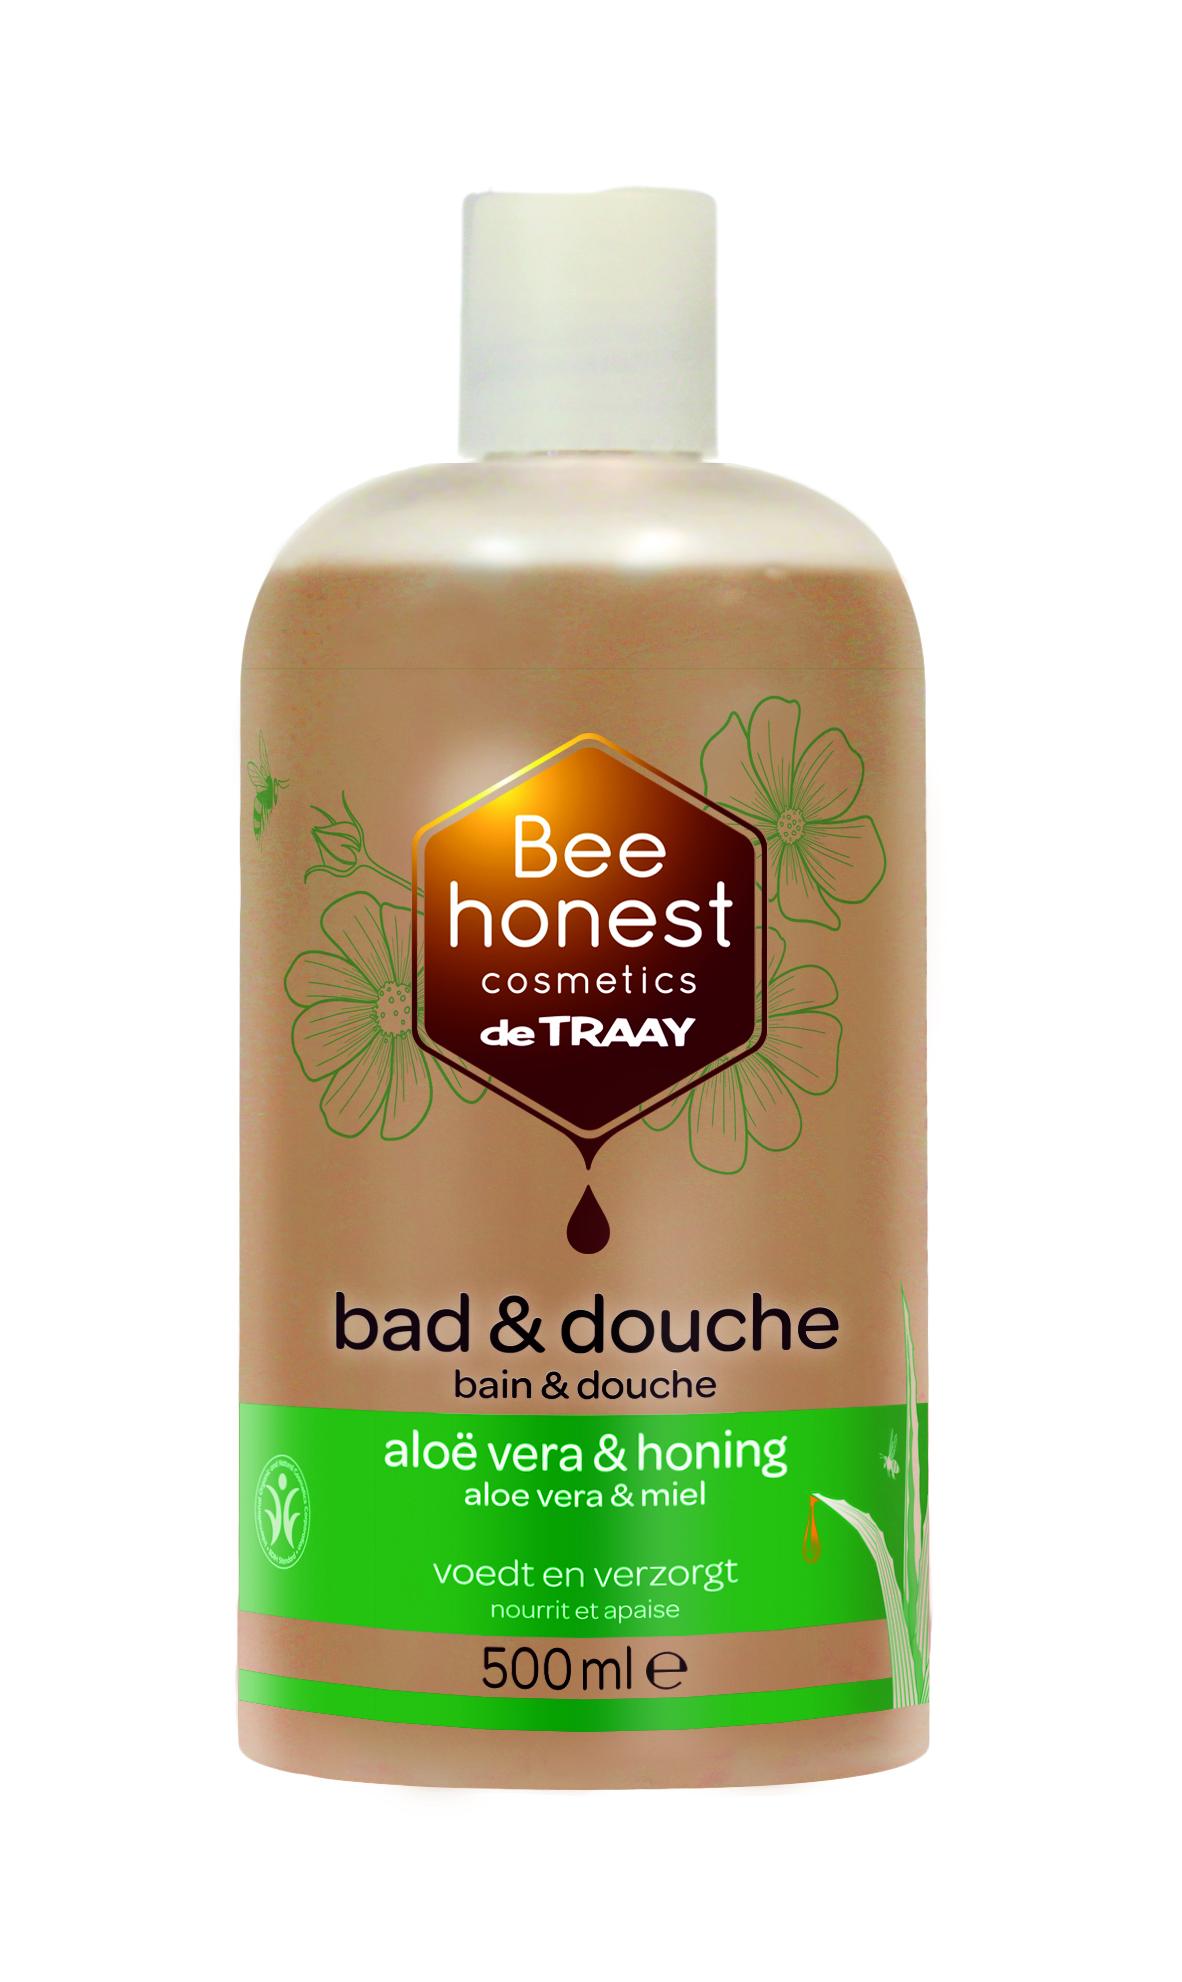 Bath & Shower Aloe vera/honey